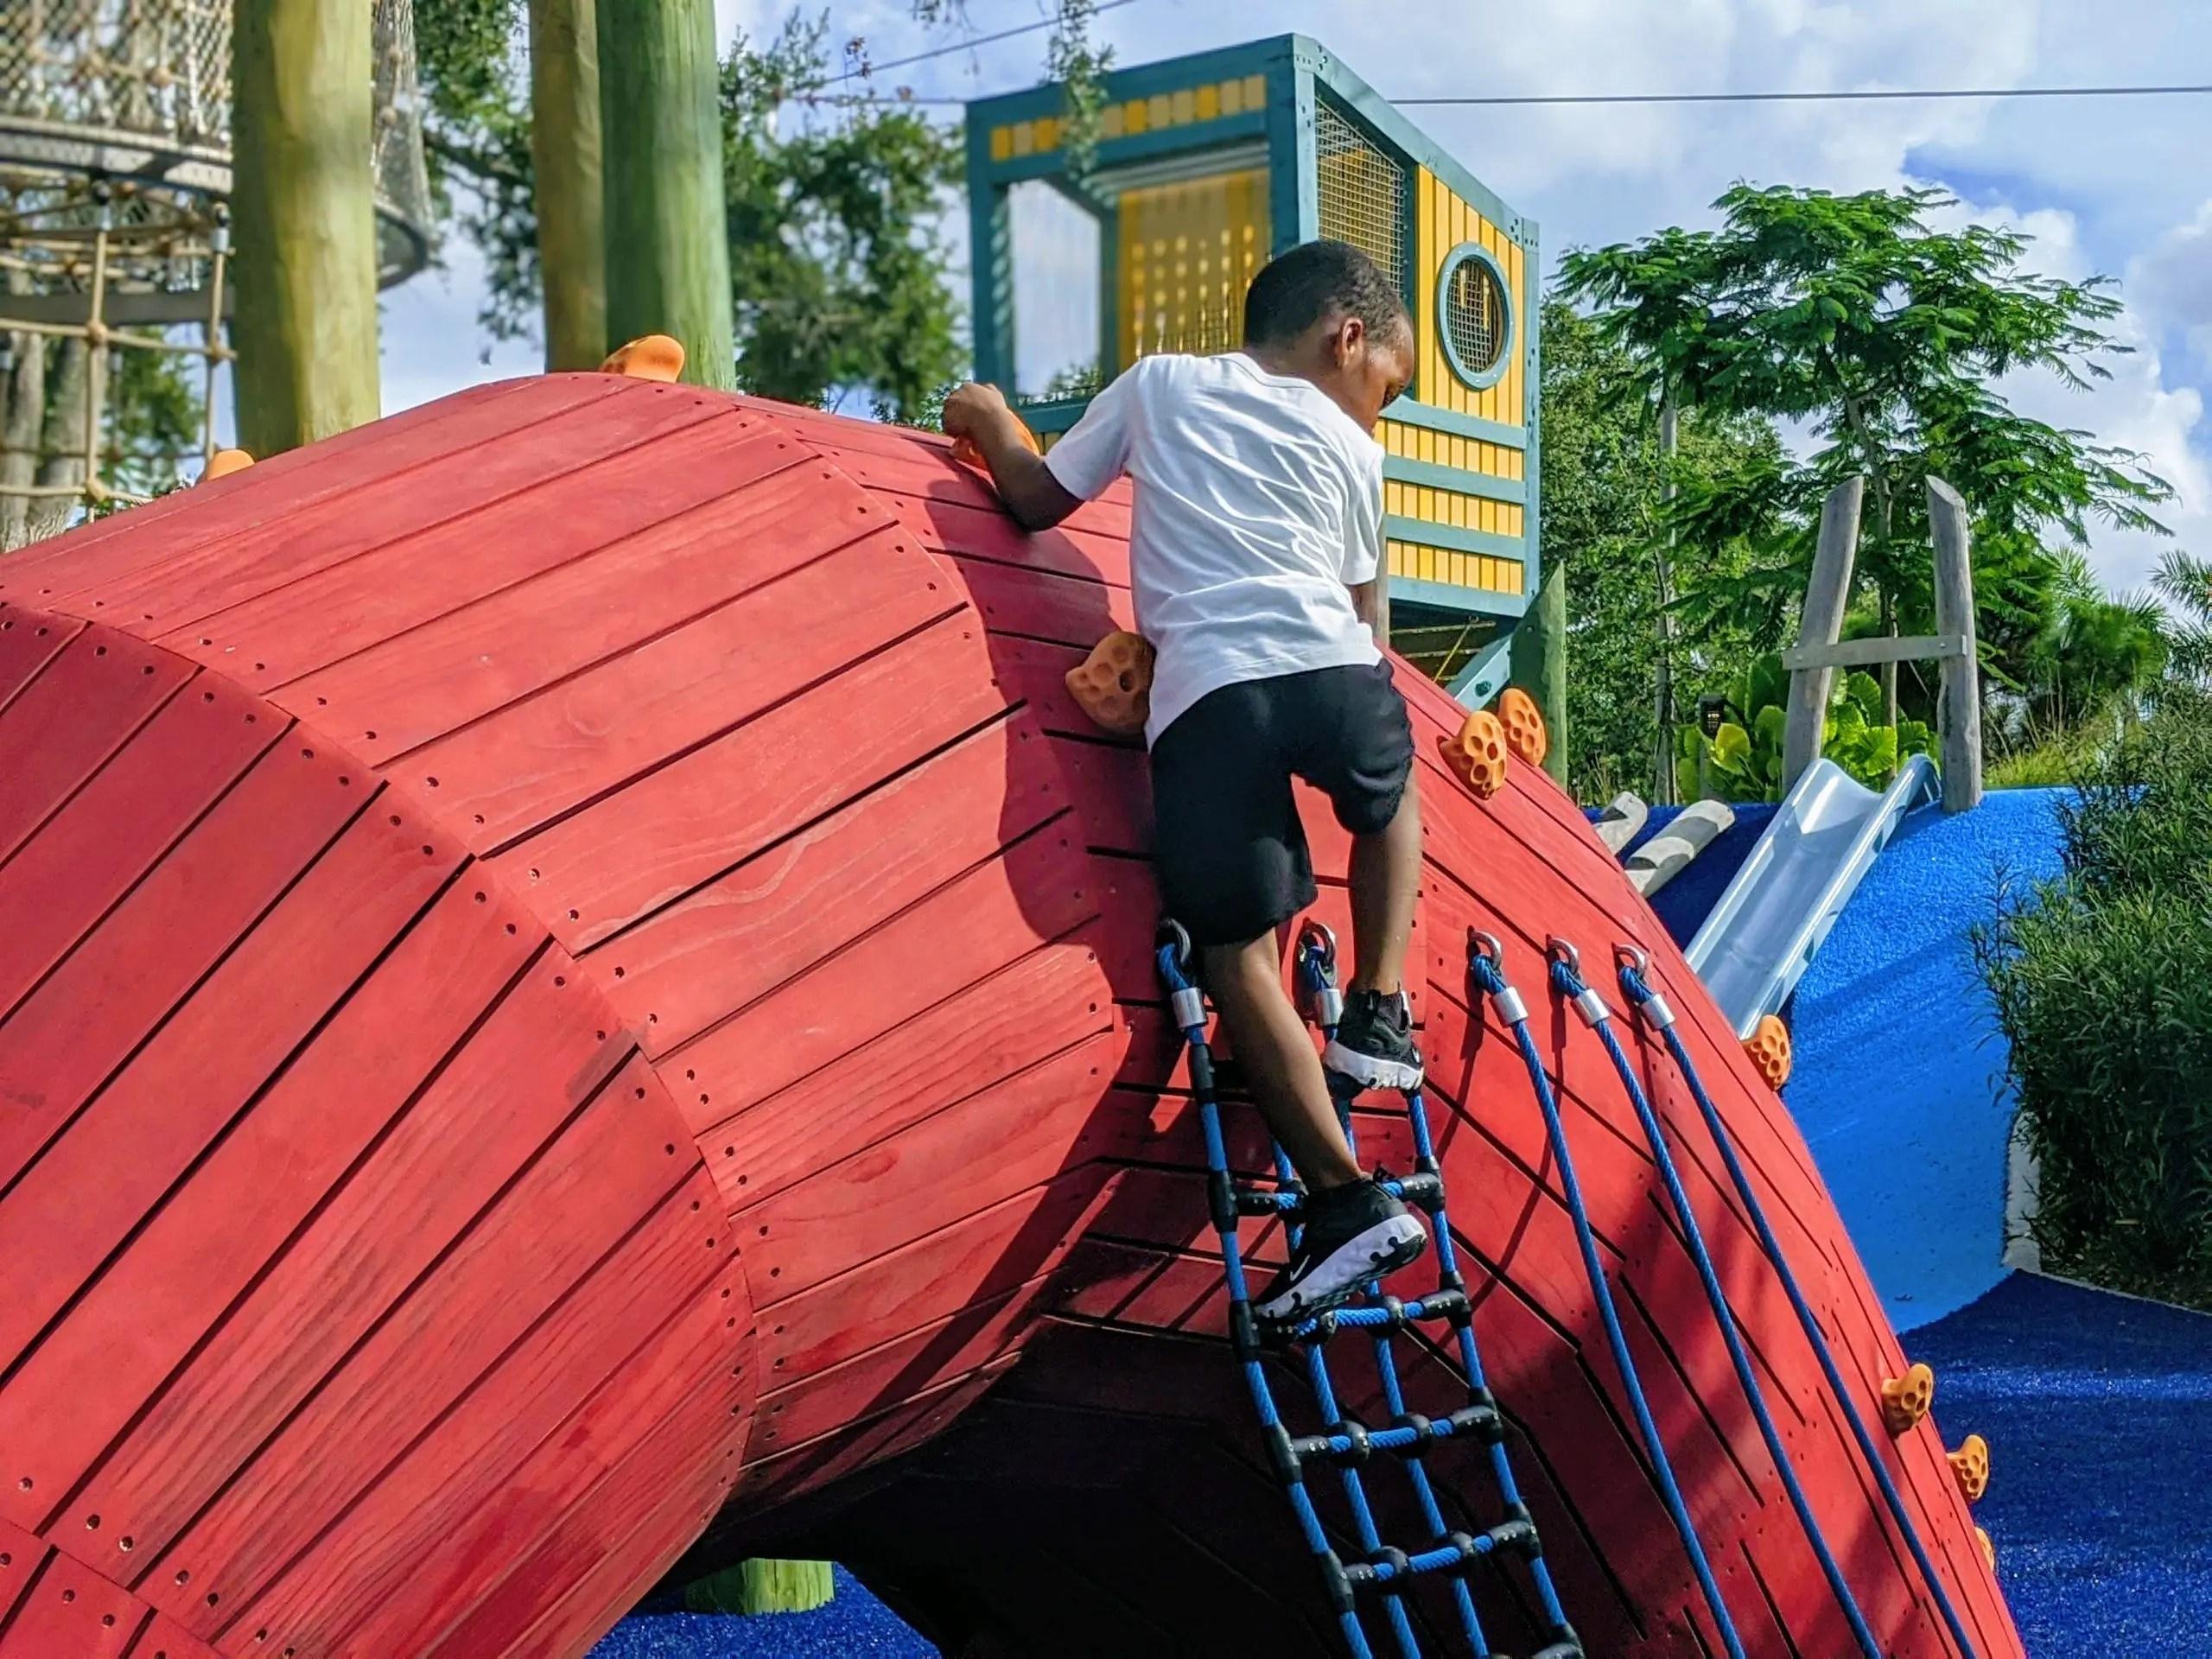 playground for kids